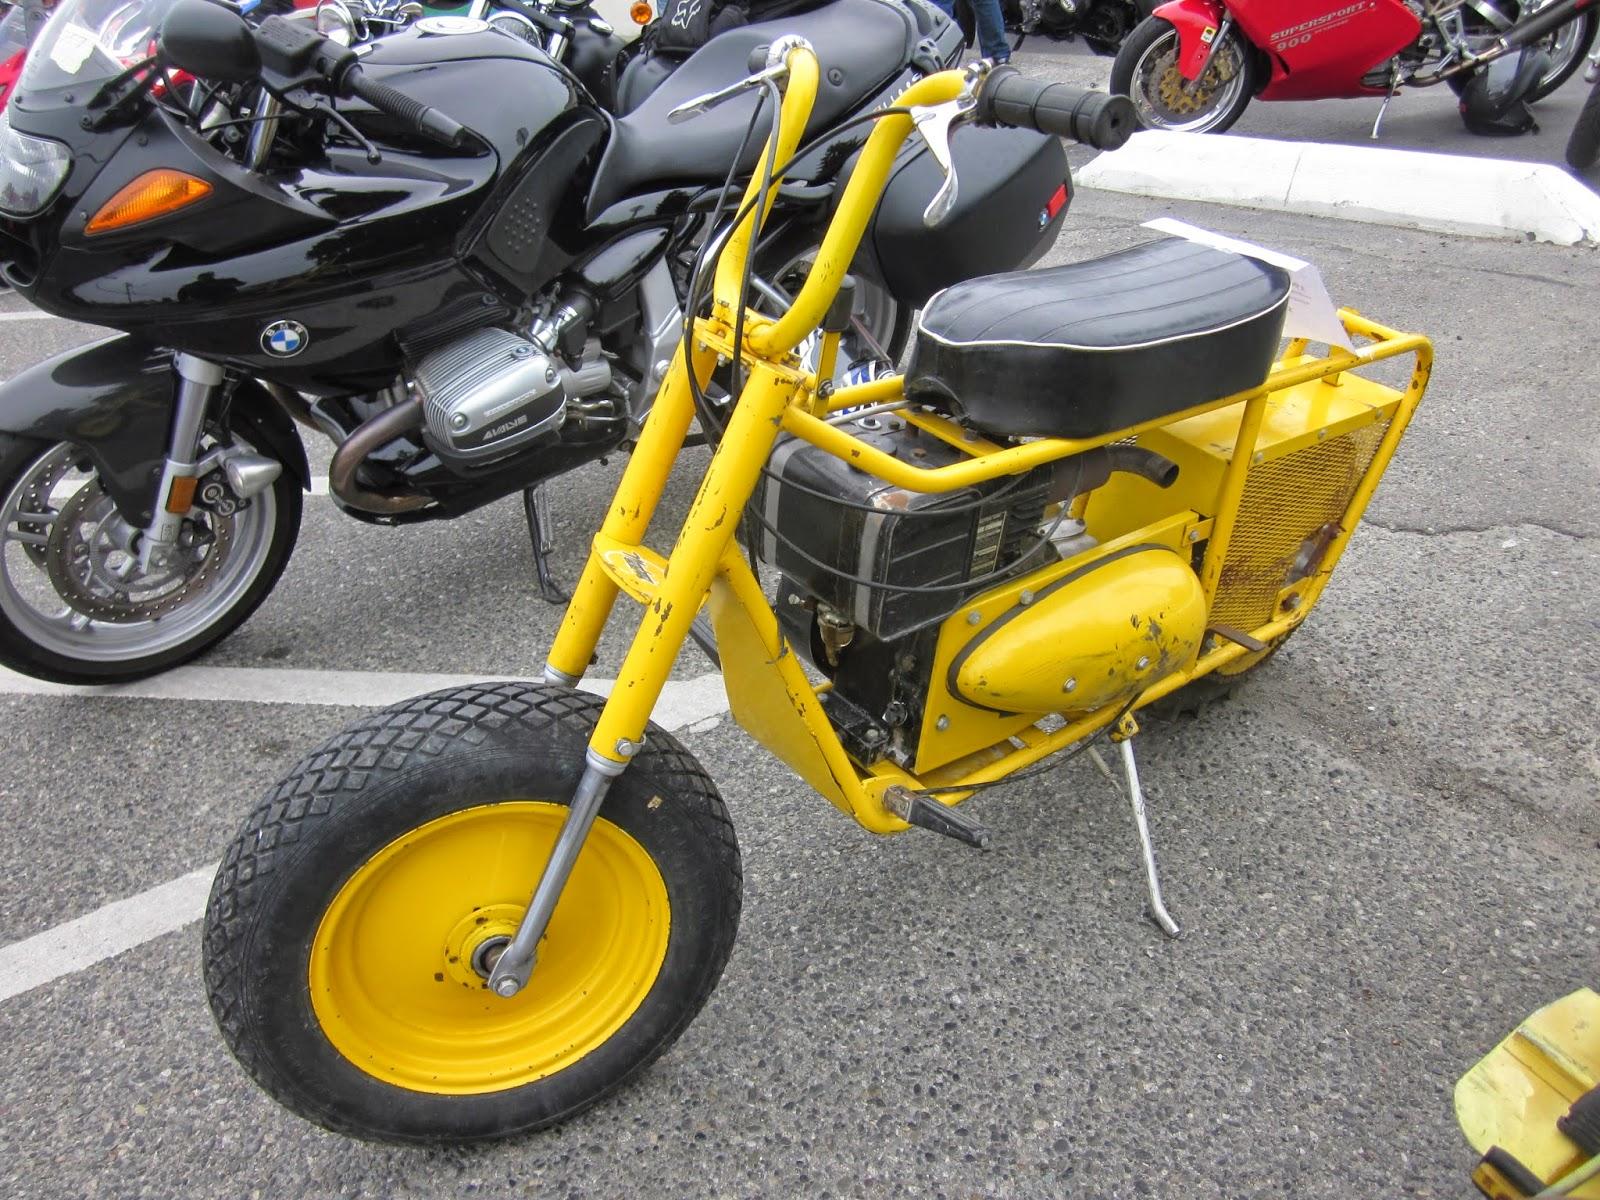 1963 Mustang Motorcycle